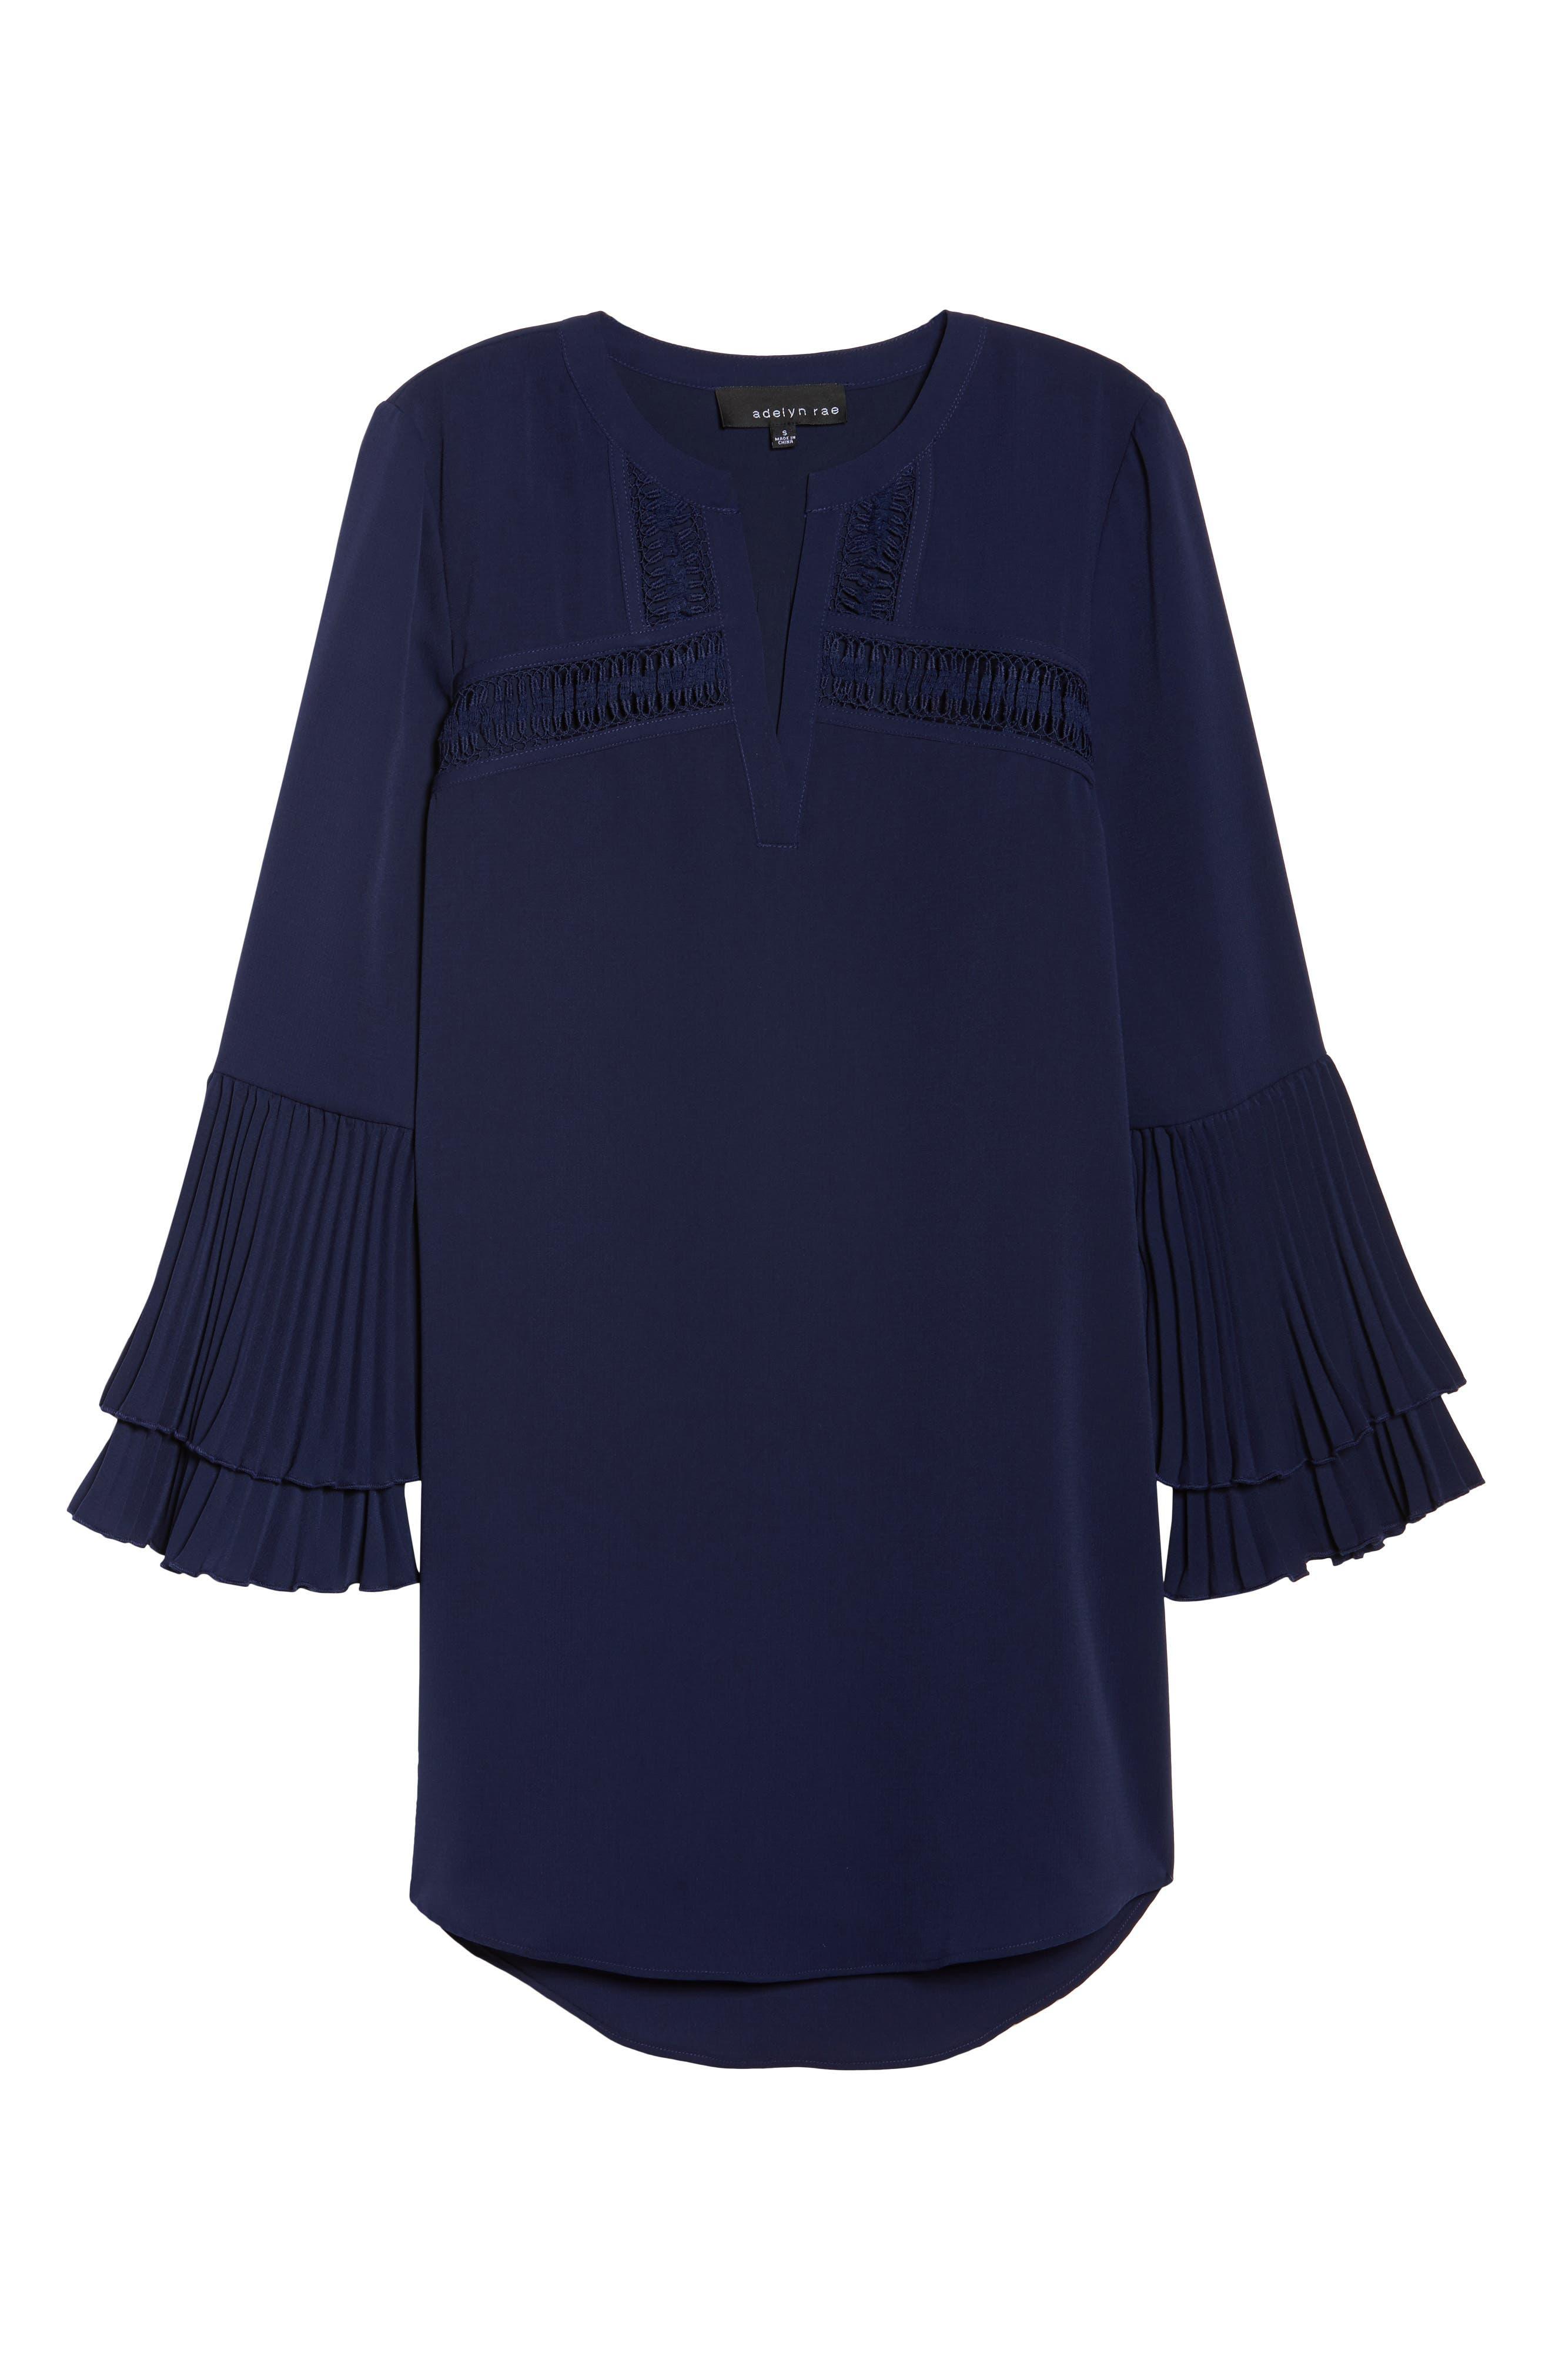 Elissa Pleat Cuff Shift Dress,                             Alternate thumbnail 6, color,                             Navy